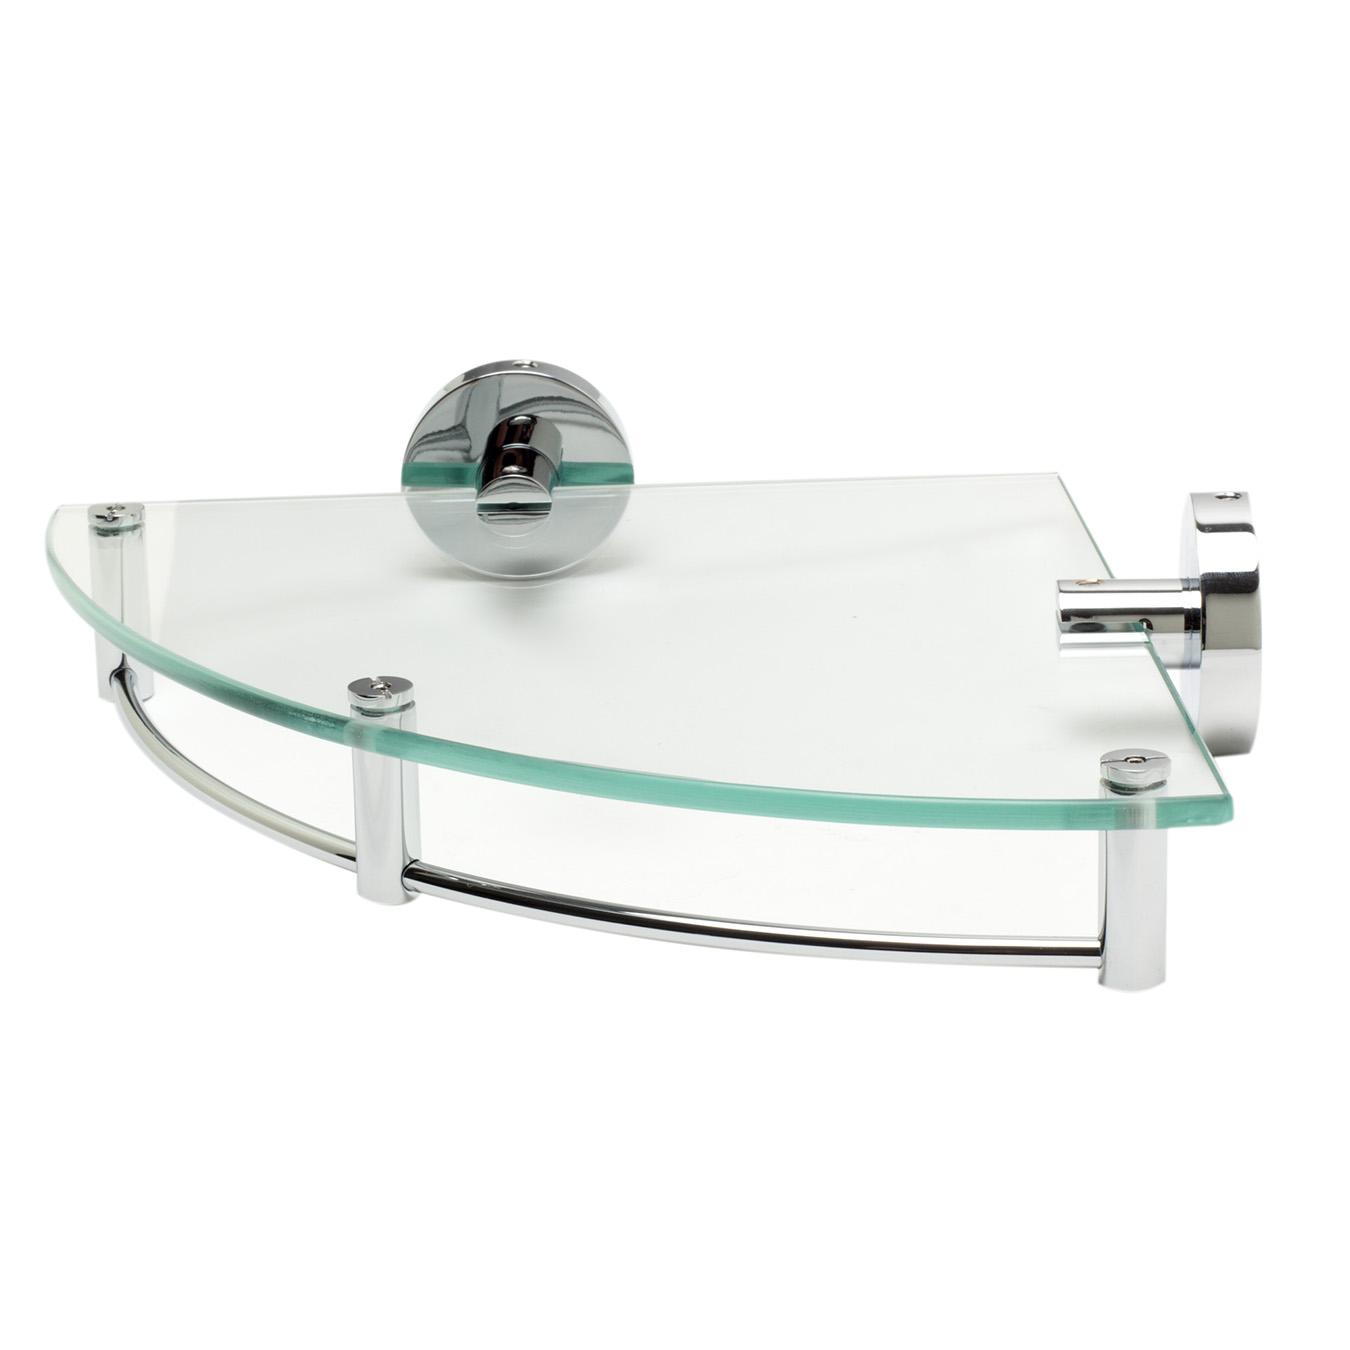 Bath4All - ALFI Brand AB9546 Polished Chrome Corner Mounted Glass ...